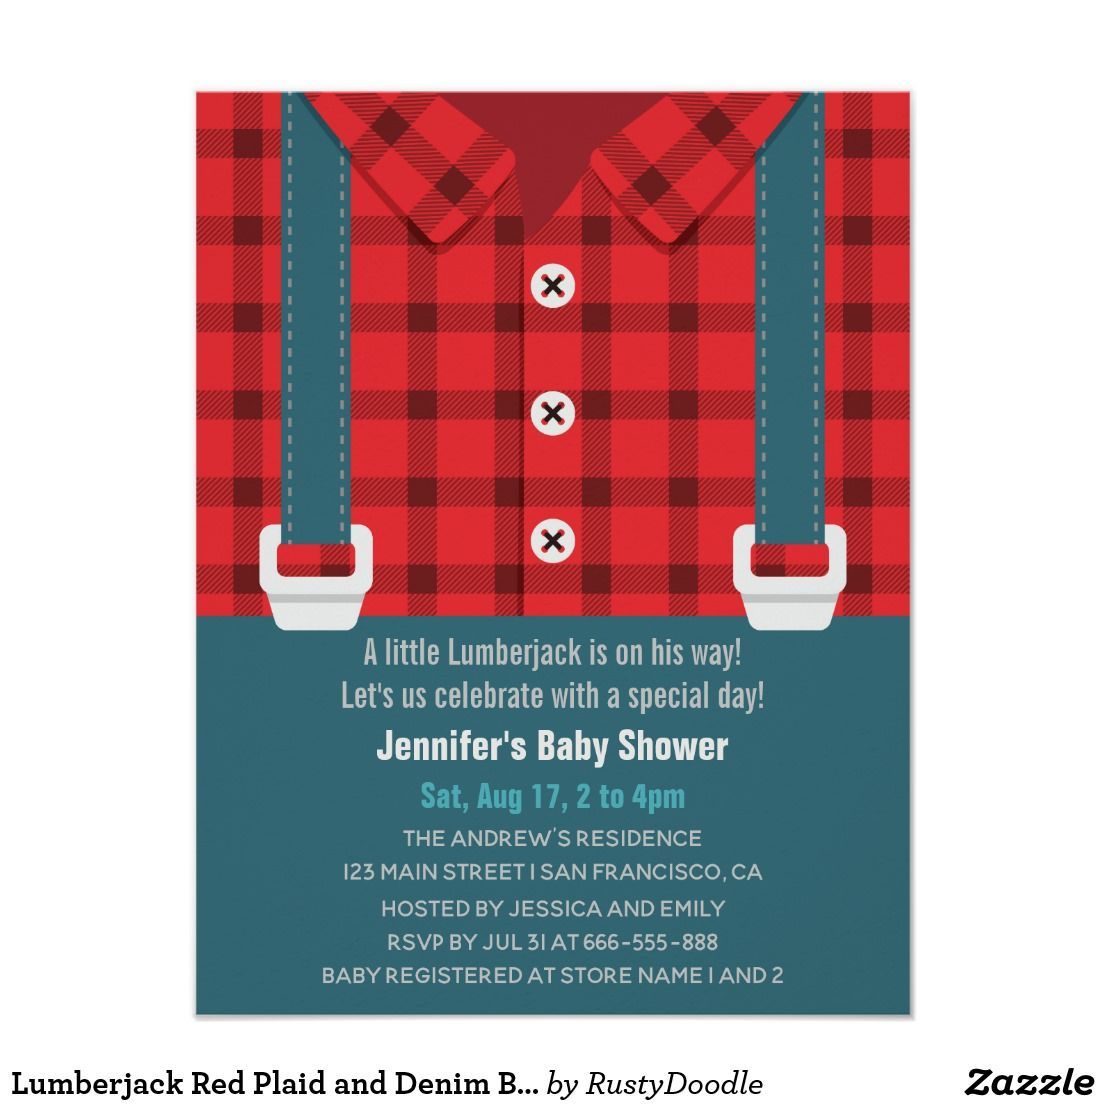 Lumberjack Red Plaid and Denim Baby Shower | Baby Shower Invitations ...